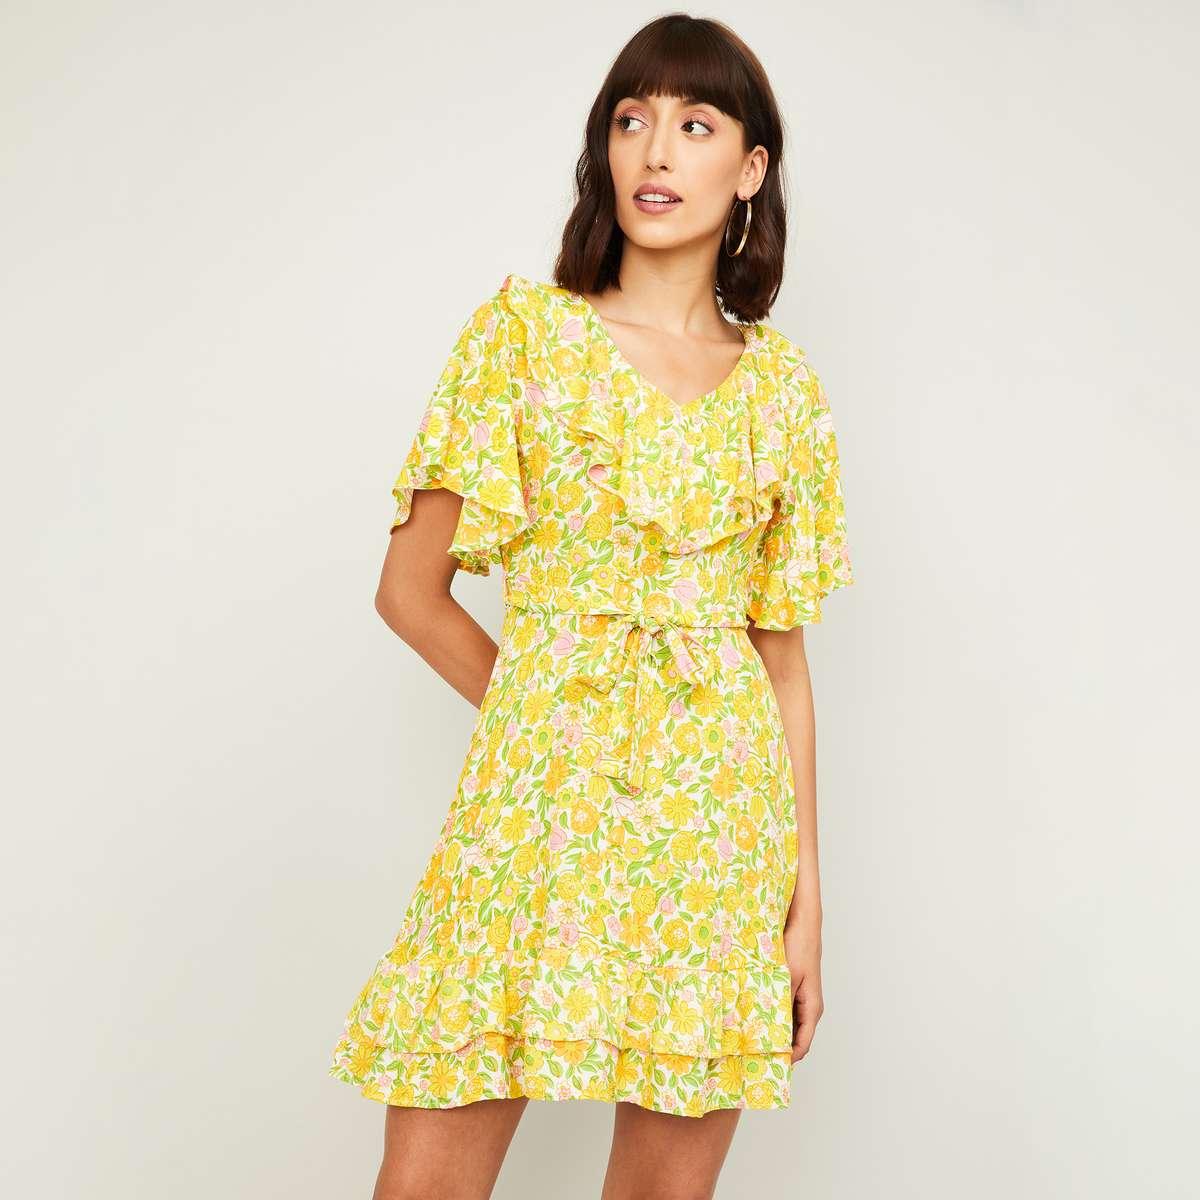 5.GINGER Women Floral Printed A-Line Dress